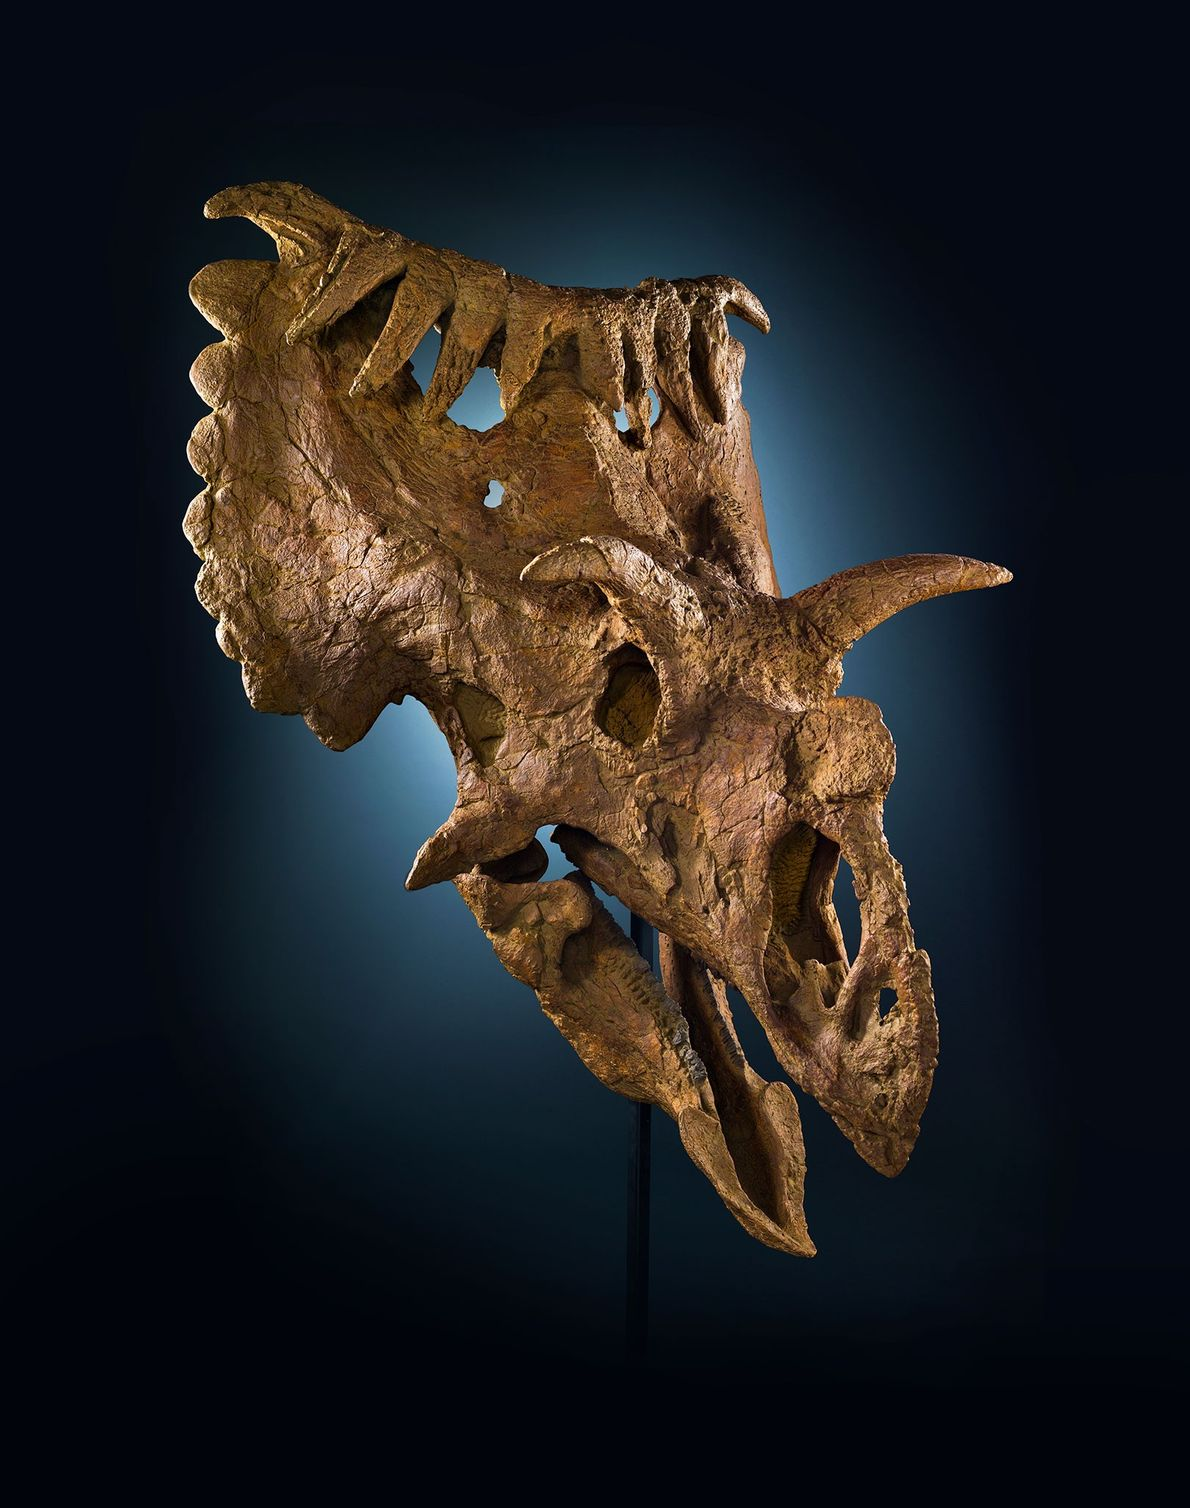 Crânio  pertence a um parente do Triceratops chamado Kosmoceratops richardsoni.